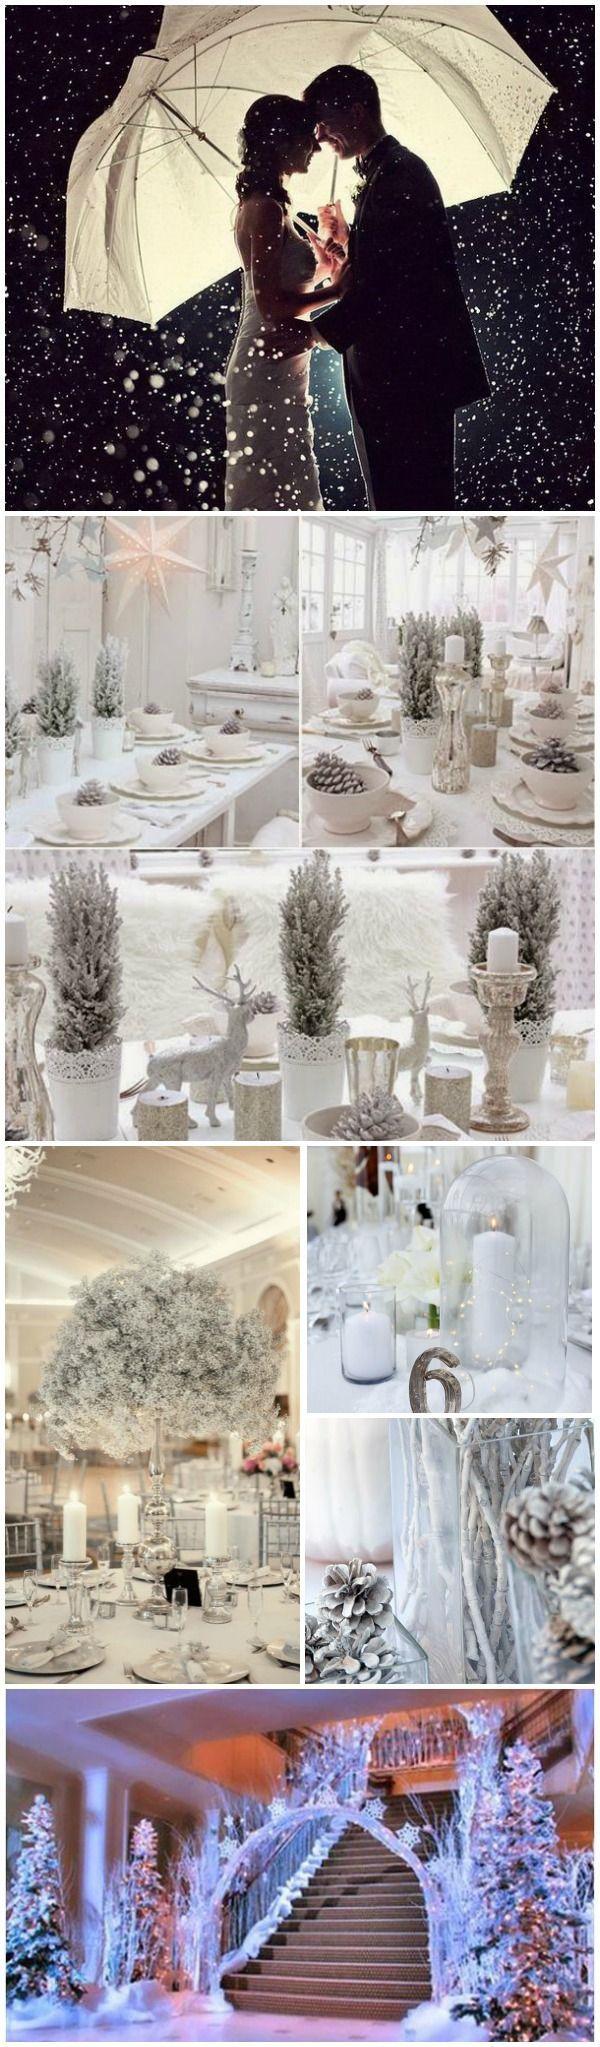 Baby's Breath Flower Themed Winter Wedding Ideas